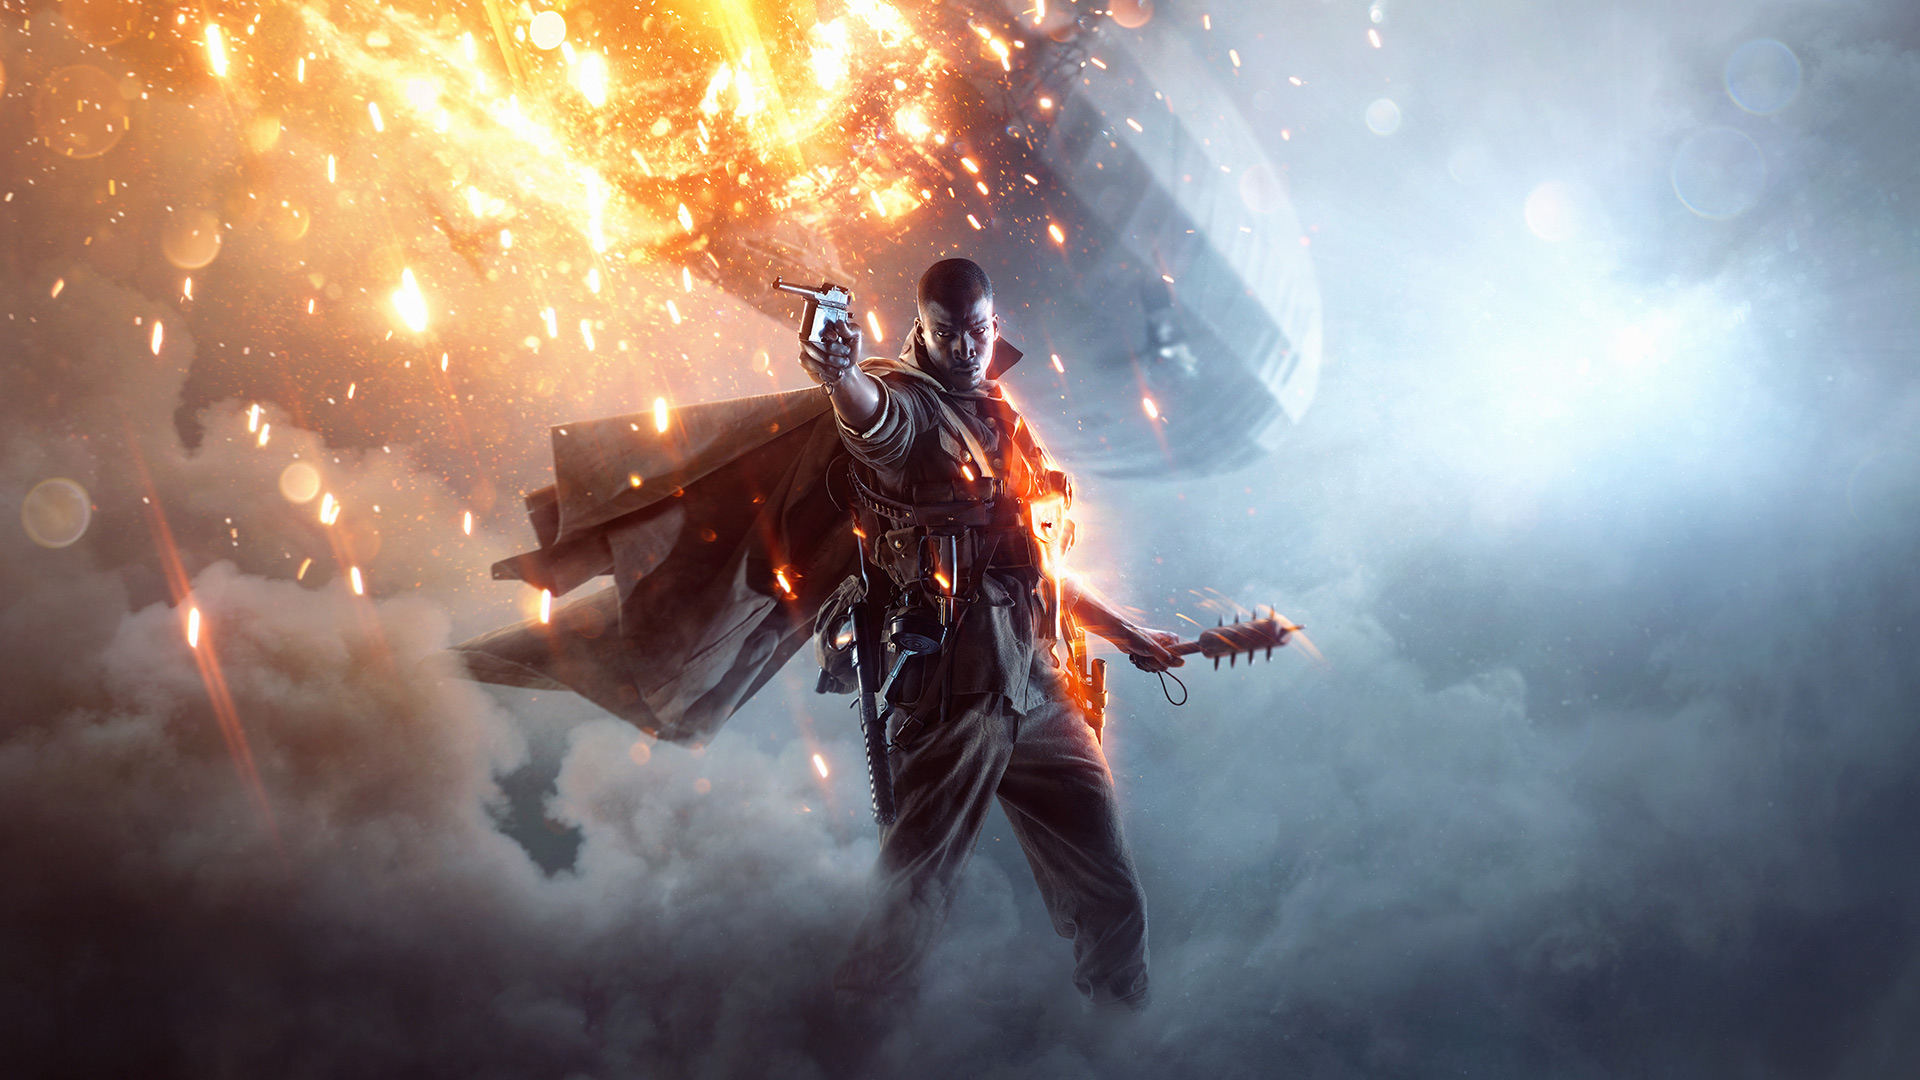 Battlefield 1 : Ultimate Edition (130€) değil 100TL